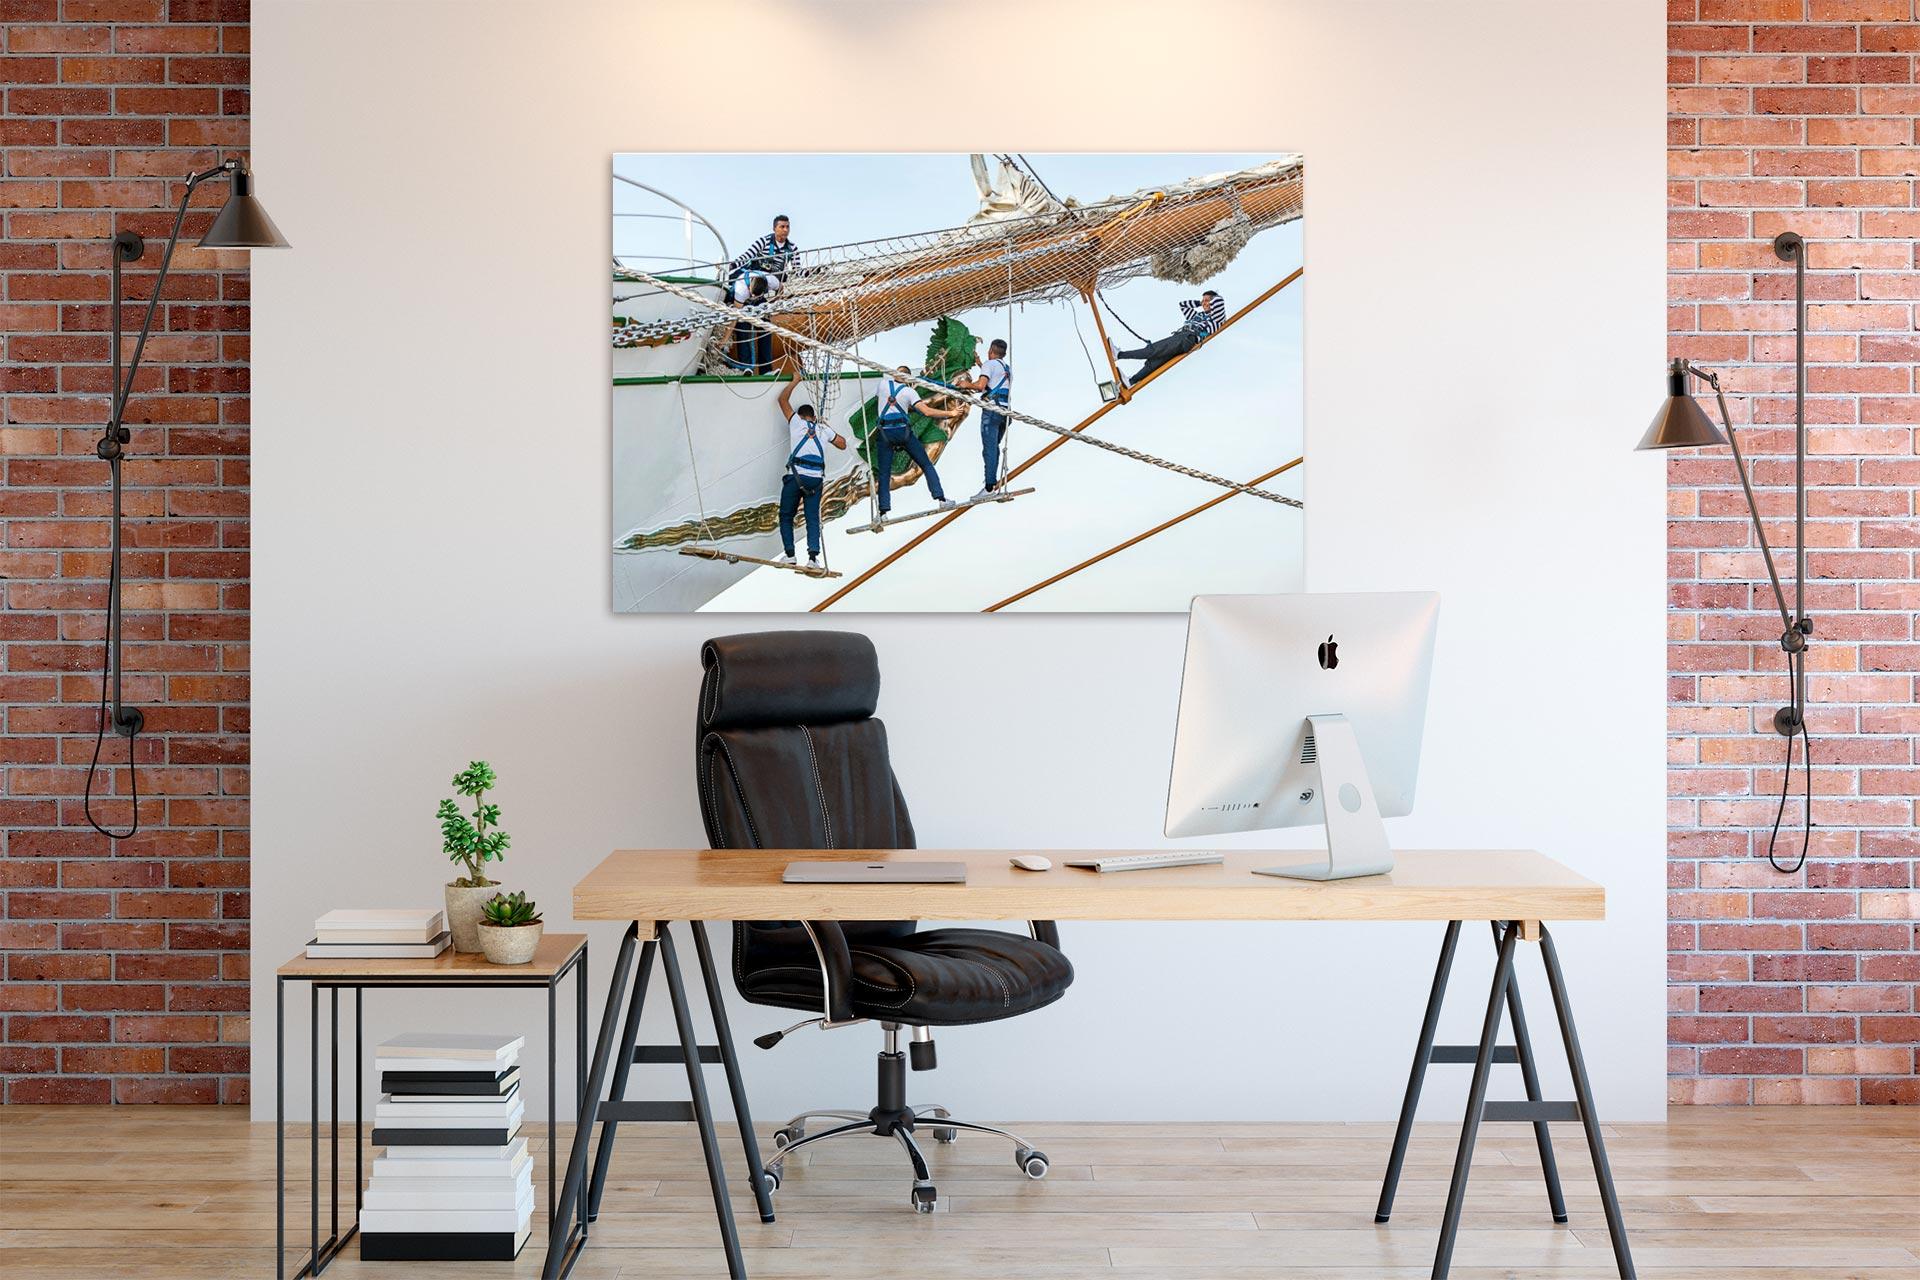 LCW263-marineros-hamburg-wandbild-bild-auf-leinwand-acrylglas-aludibond_buero